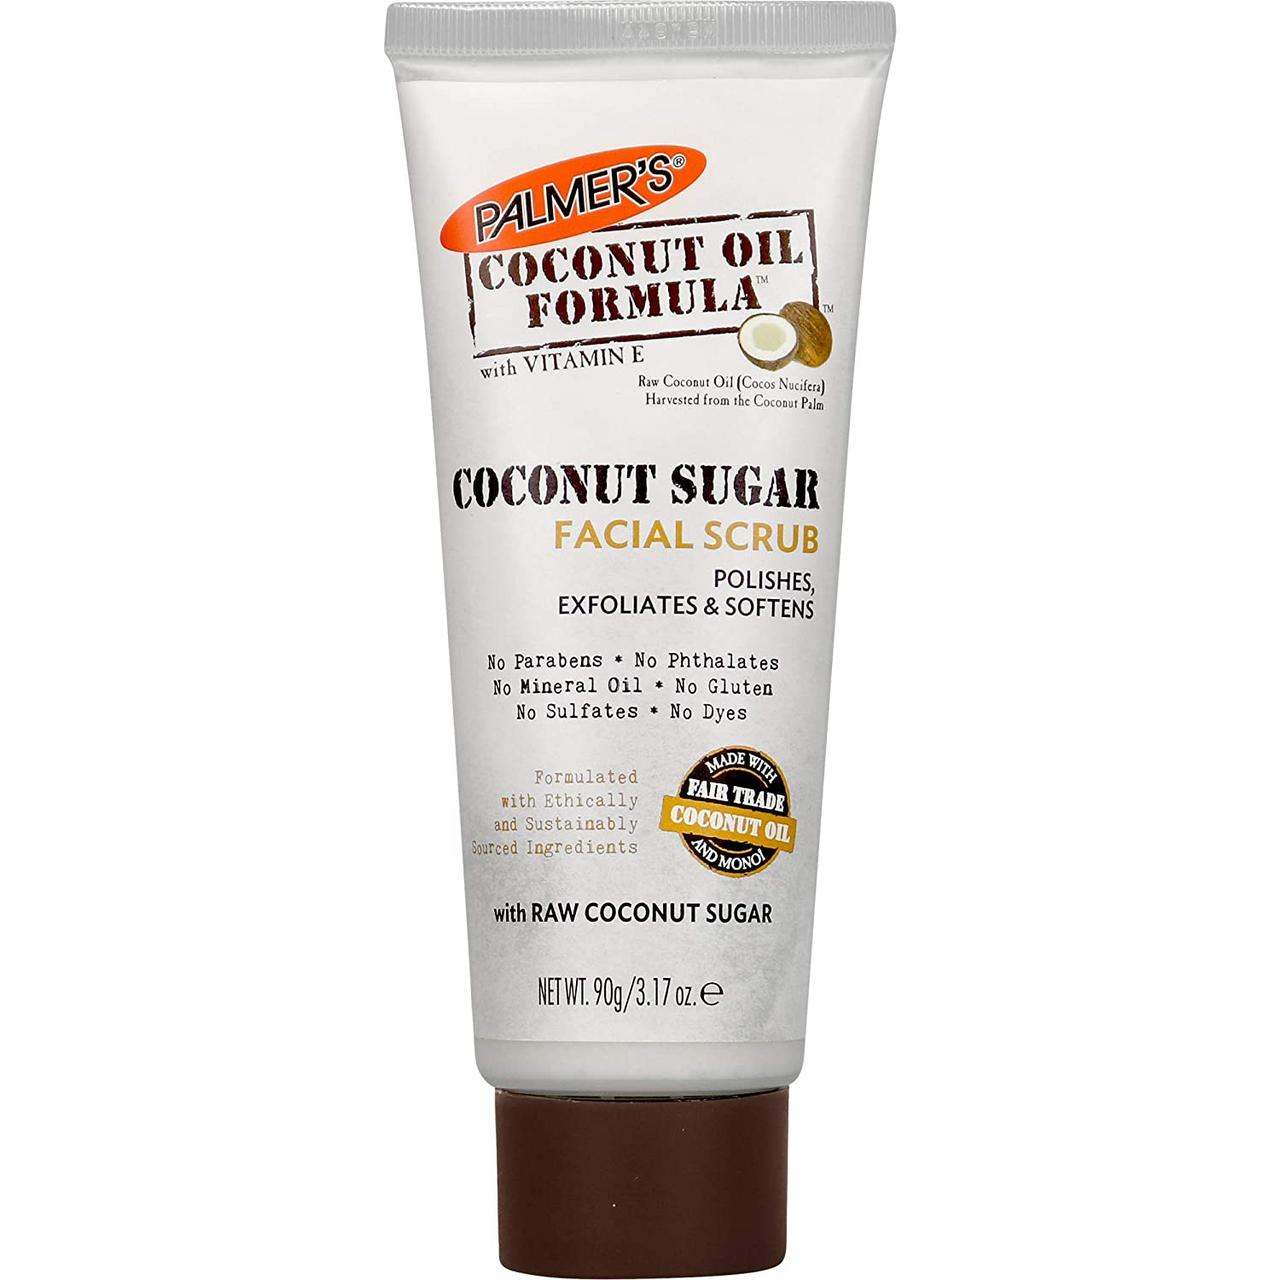 Скраб для лица с кокосовым сахаром Palmer's Coconut Sugar Facial Scrub 90 г